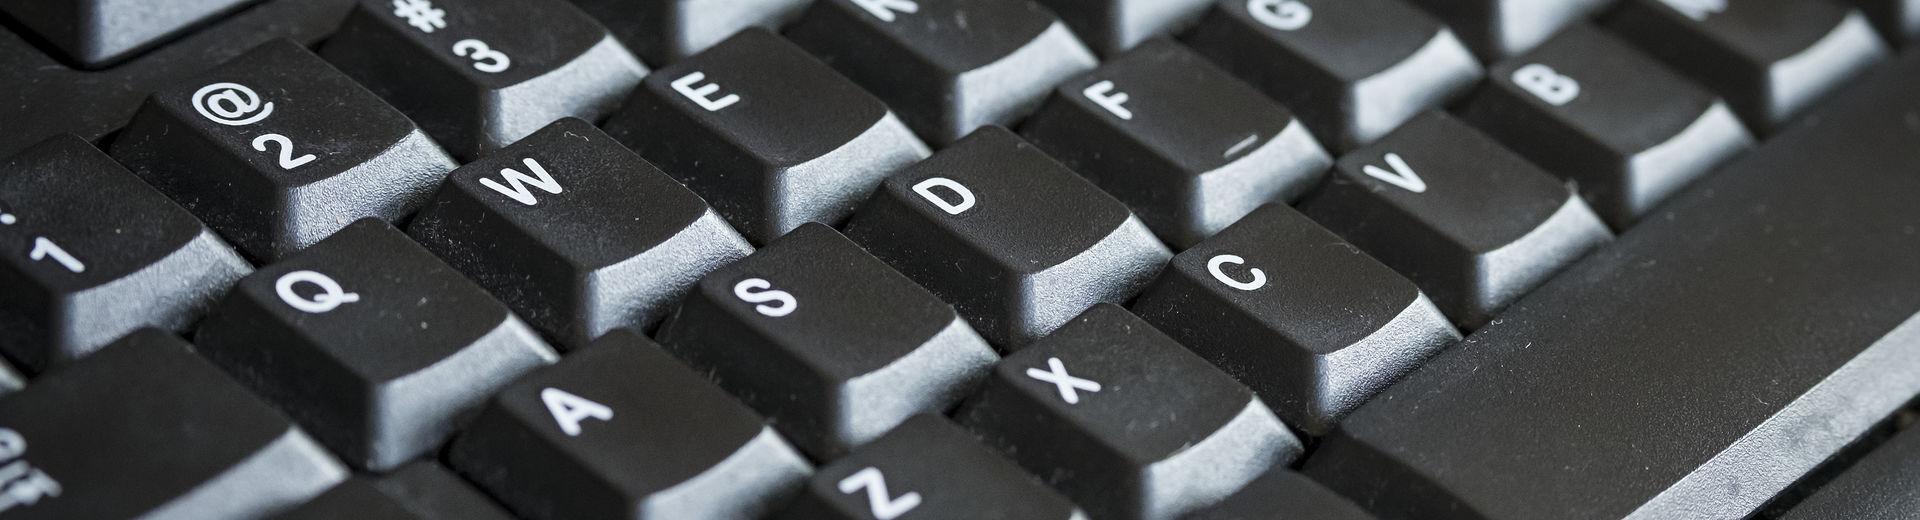 A close-up black computer keyboard.